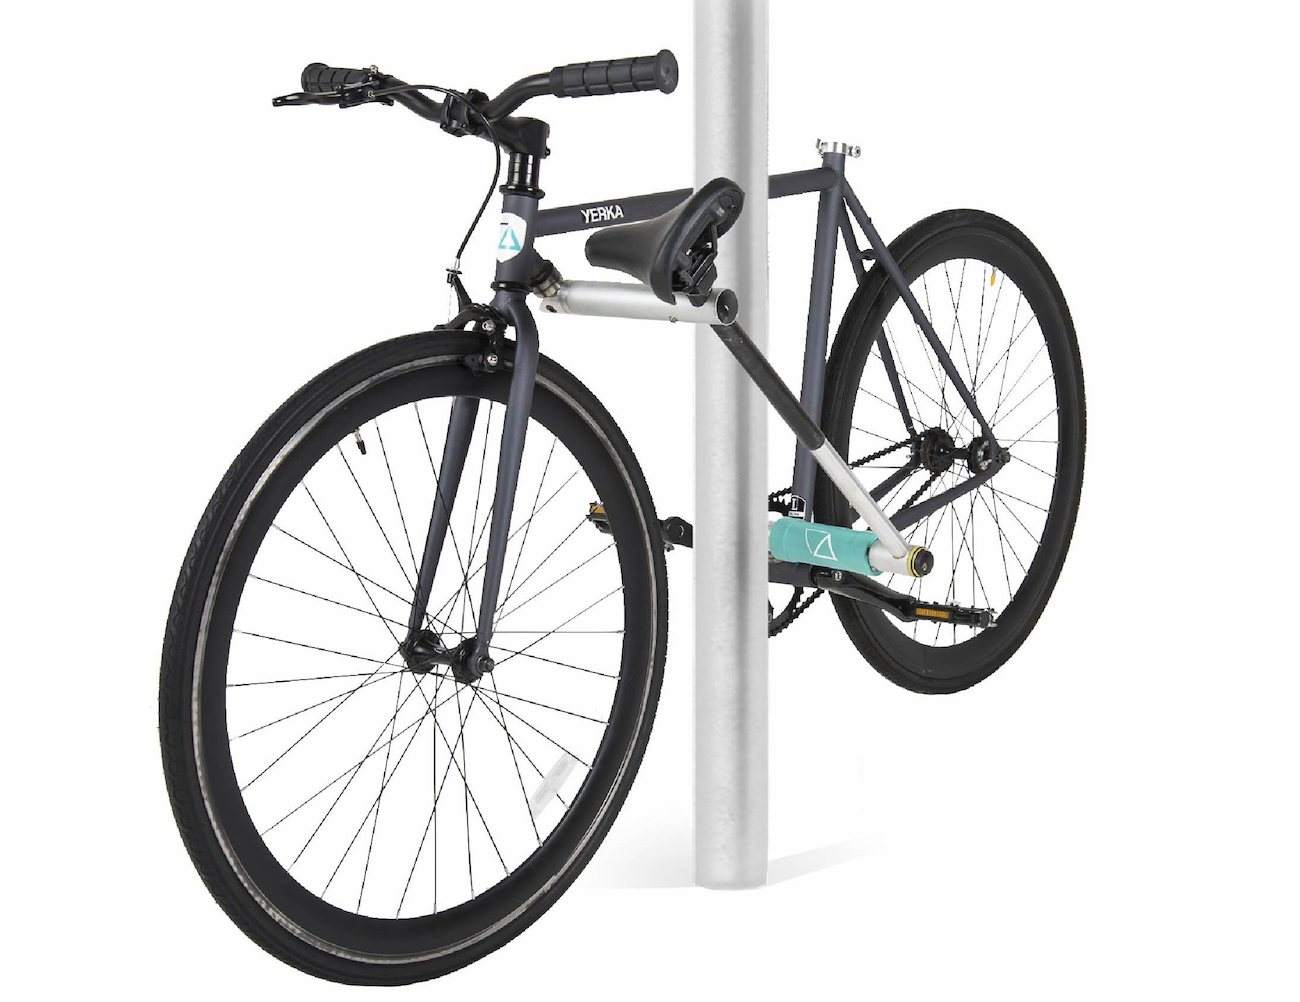 yerka-the-unstealable-bike-04